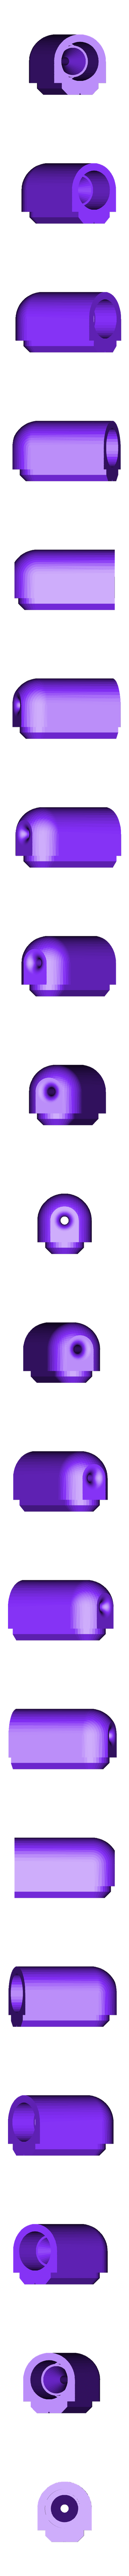 Pensa003_Bender_Head_2.stl Download free STL file WireBender in Metric • 3D print template, yttrium